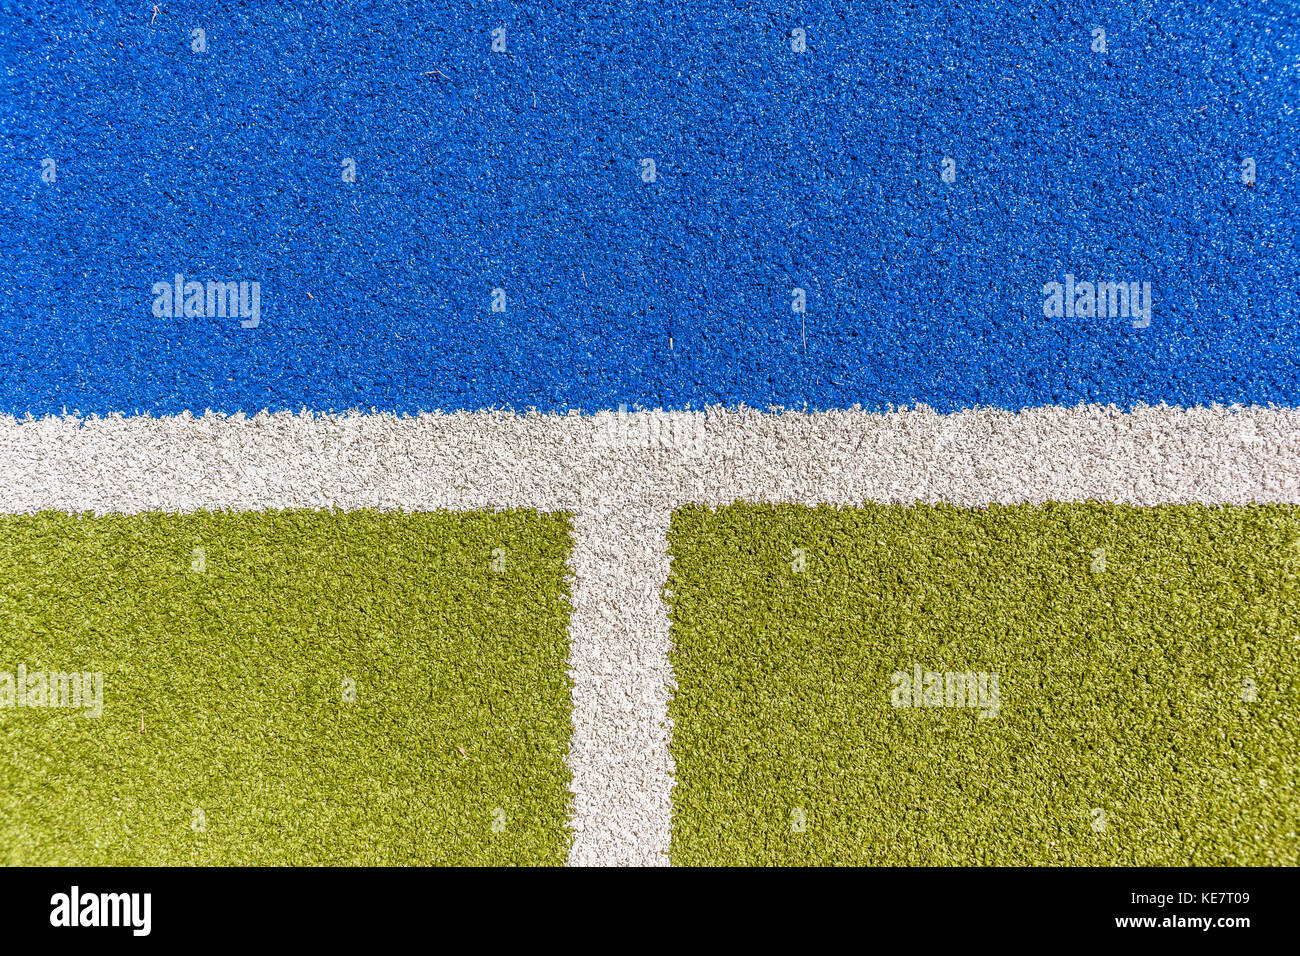 https://c8.alamy.com/compes/ke7t09/deportes-campo-de-cesped-sintetico-astro-closeup-limite-linea-blanca-con-detalles-verdes-y-azules-ke7t09.jpg